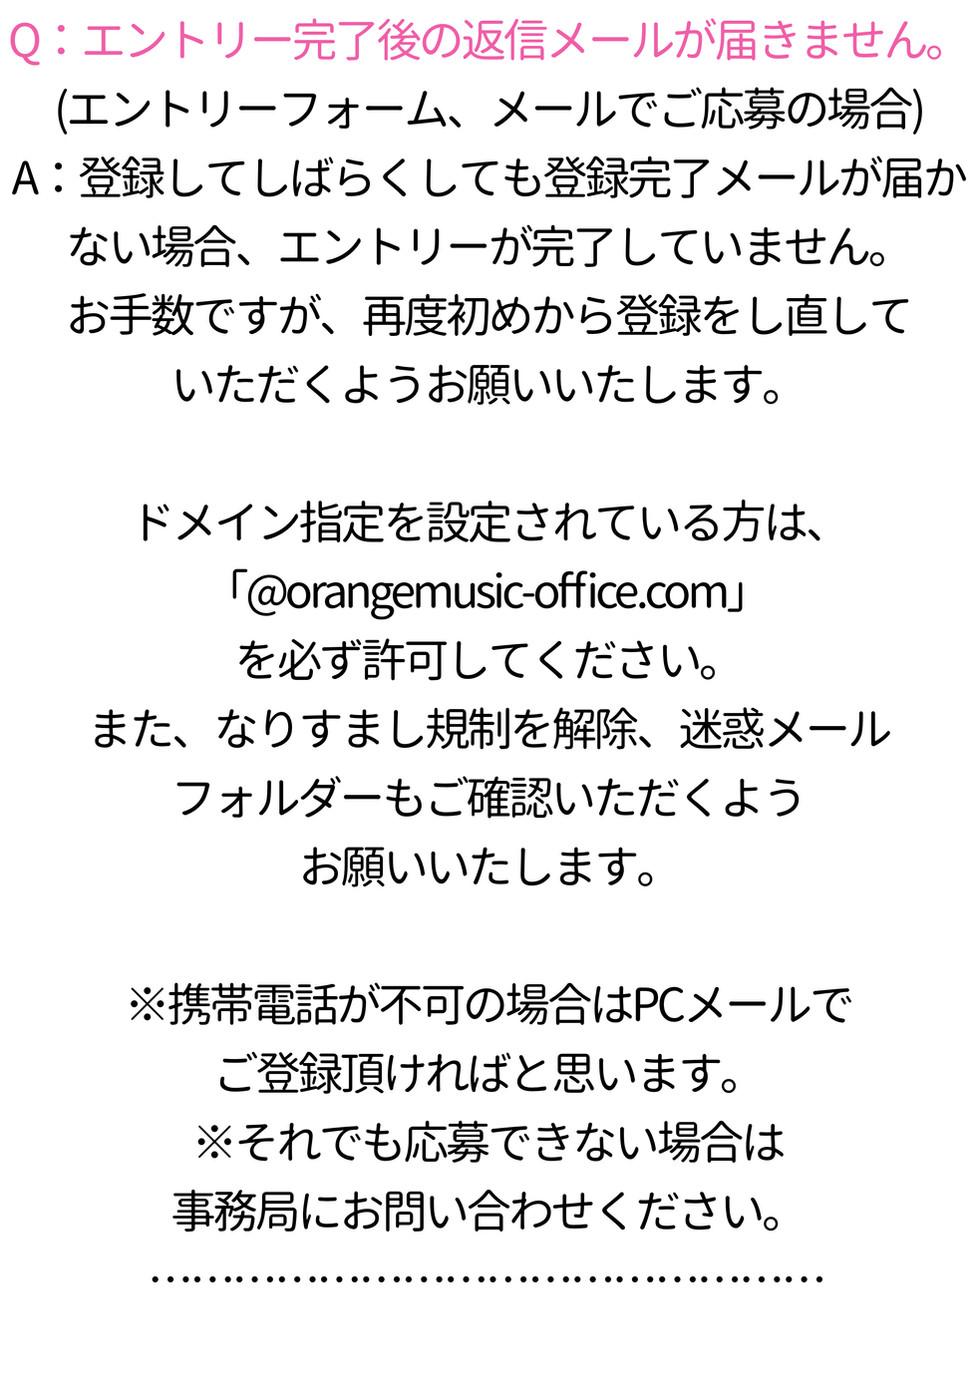 13_OPA_QA4.jpg